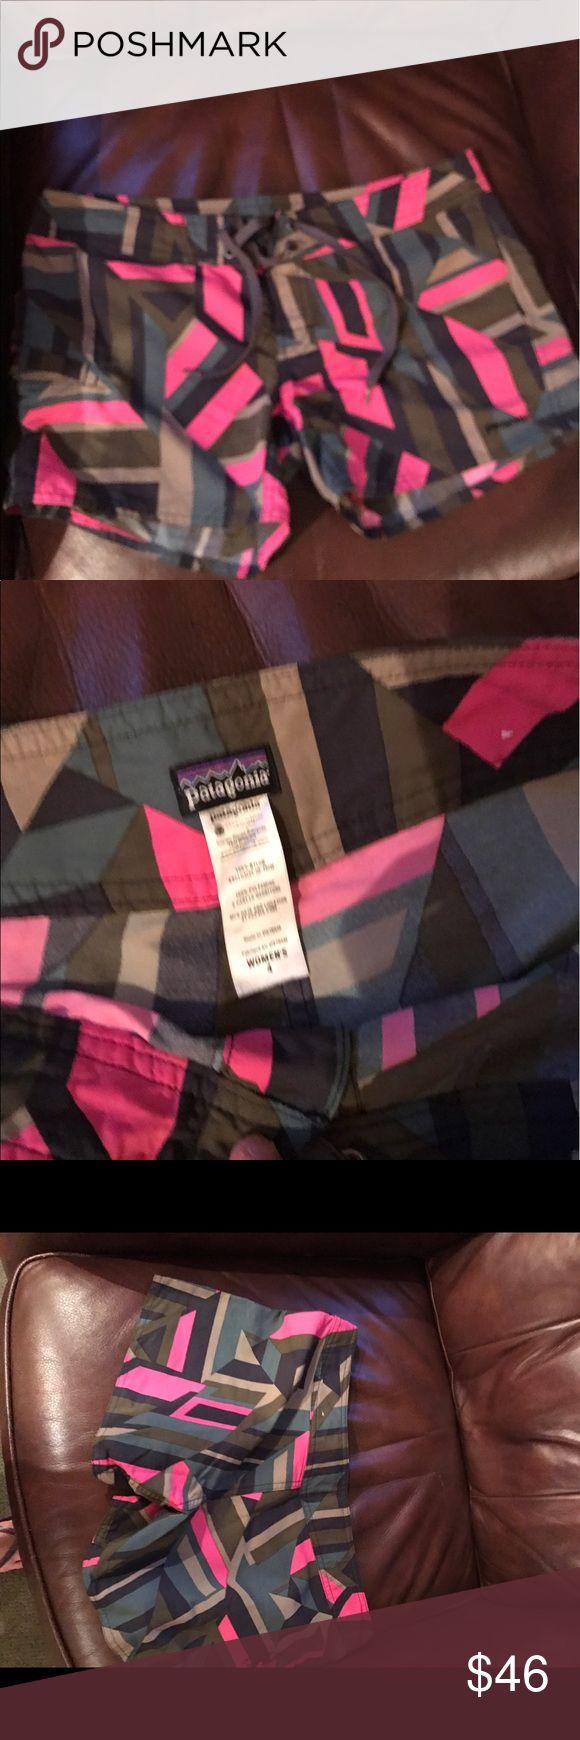 Patagonia board shorts Velcro, tie waisted Patagonia Shorts